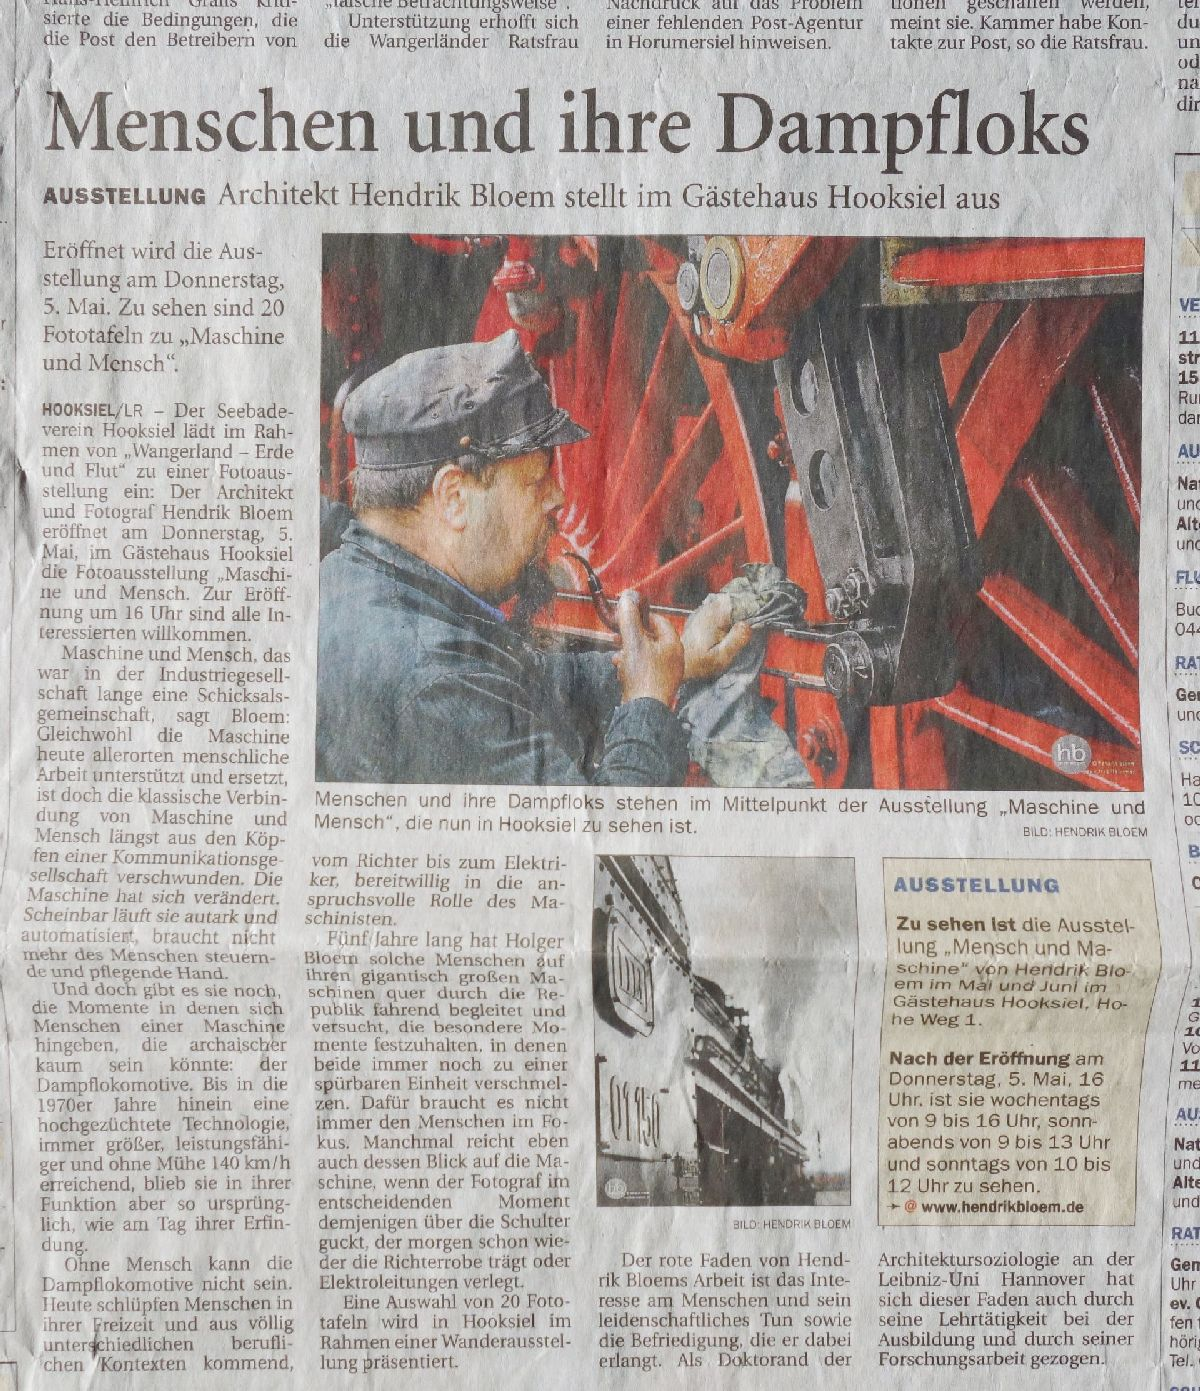 klein10_Hendrik Bloem_www.hendrikbloem.de_Maschine und Mensch